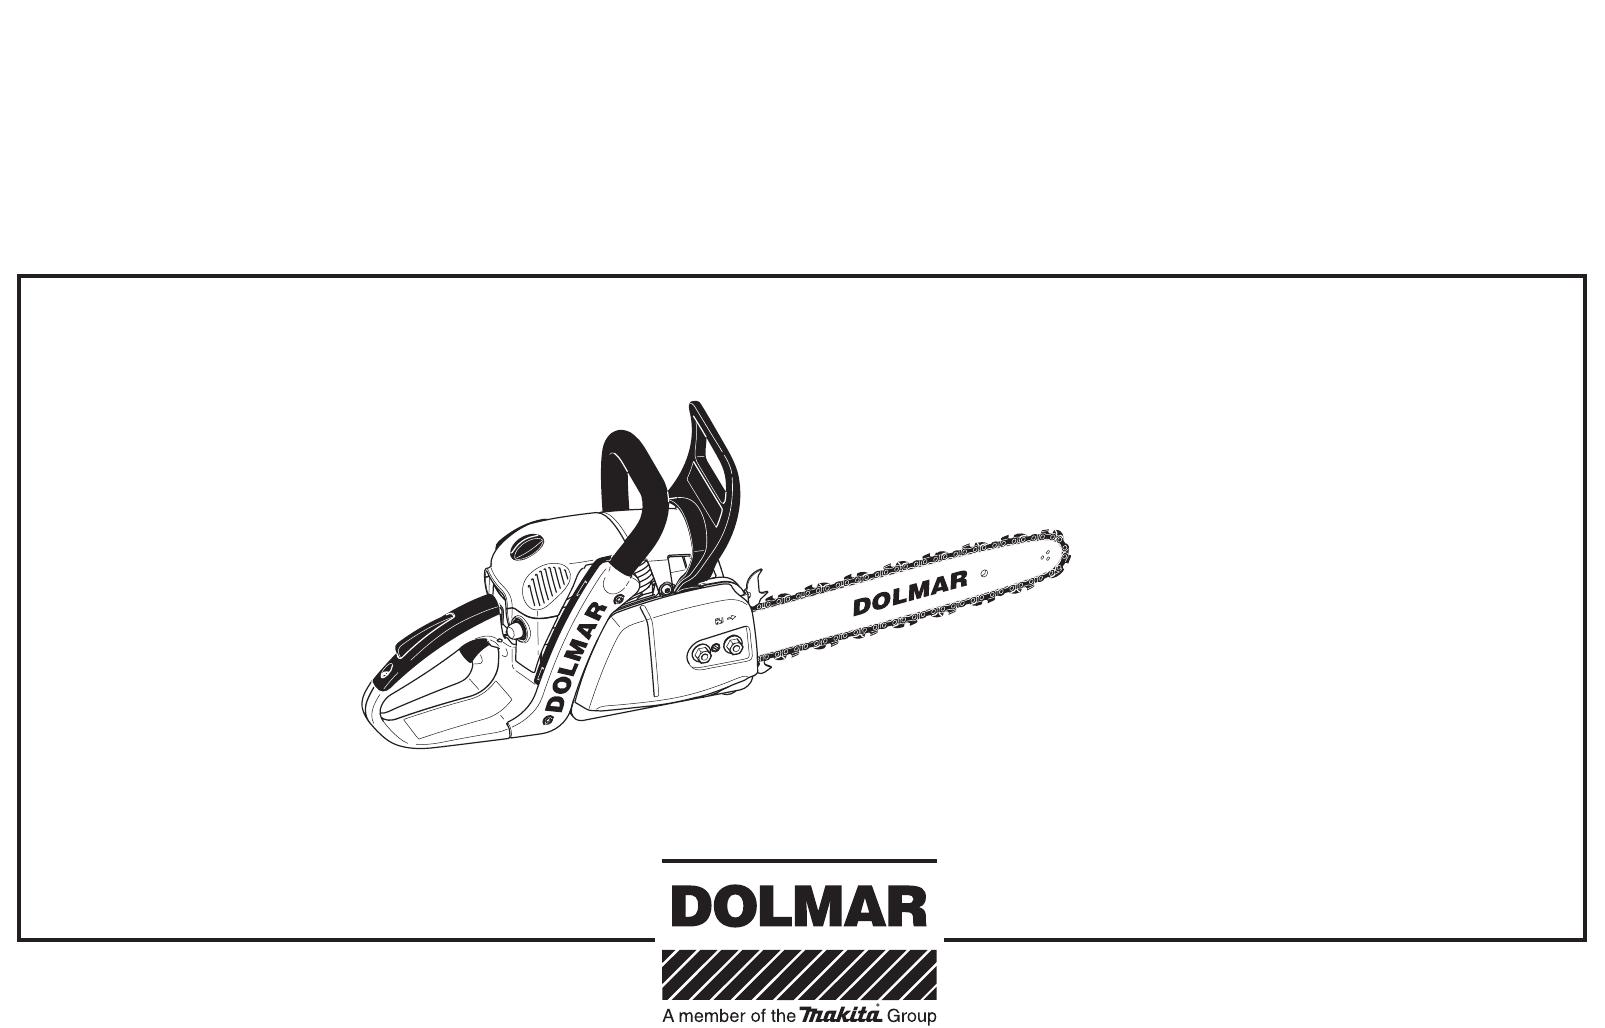 Dolmar Ps 350 Users Manual